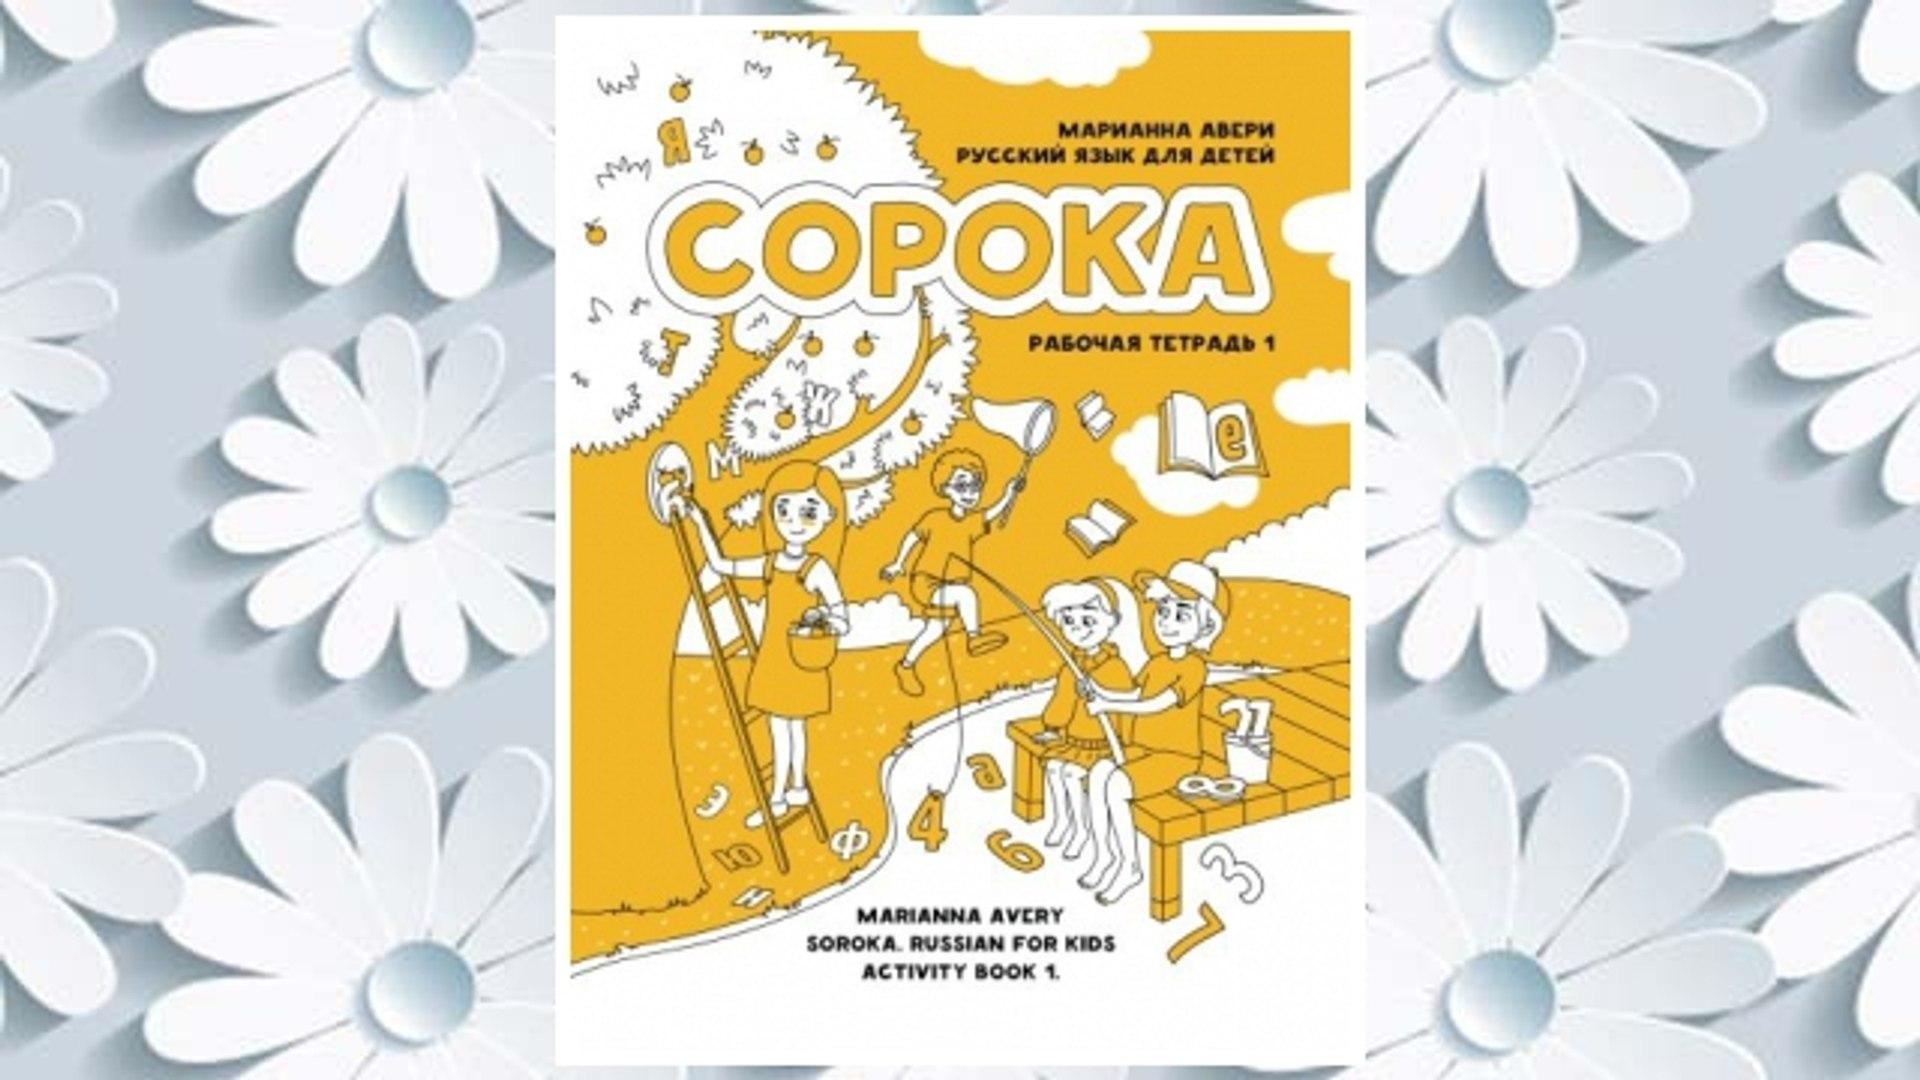 Download PDF Soroka. Russian for Kids: Activity Book 1: Activity Book 1 (Russian Edition) FREE